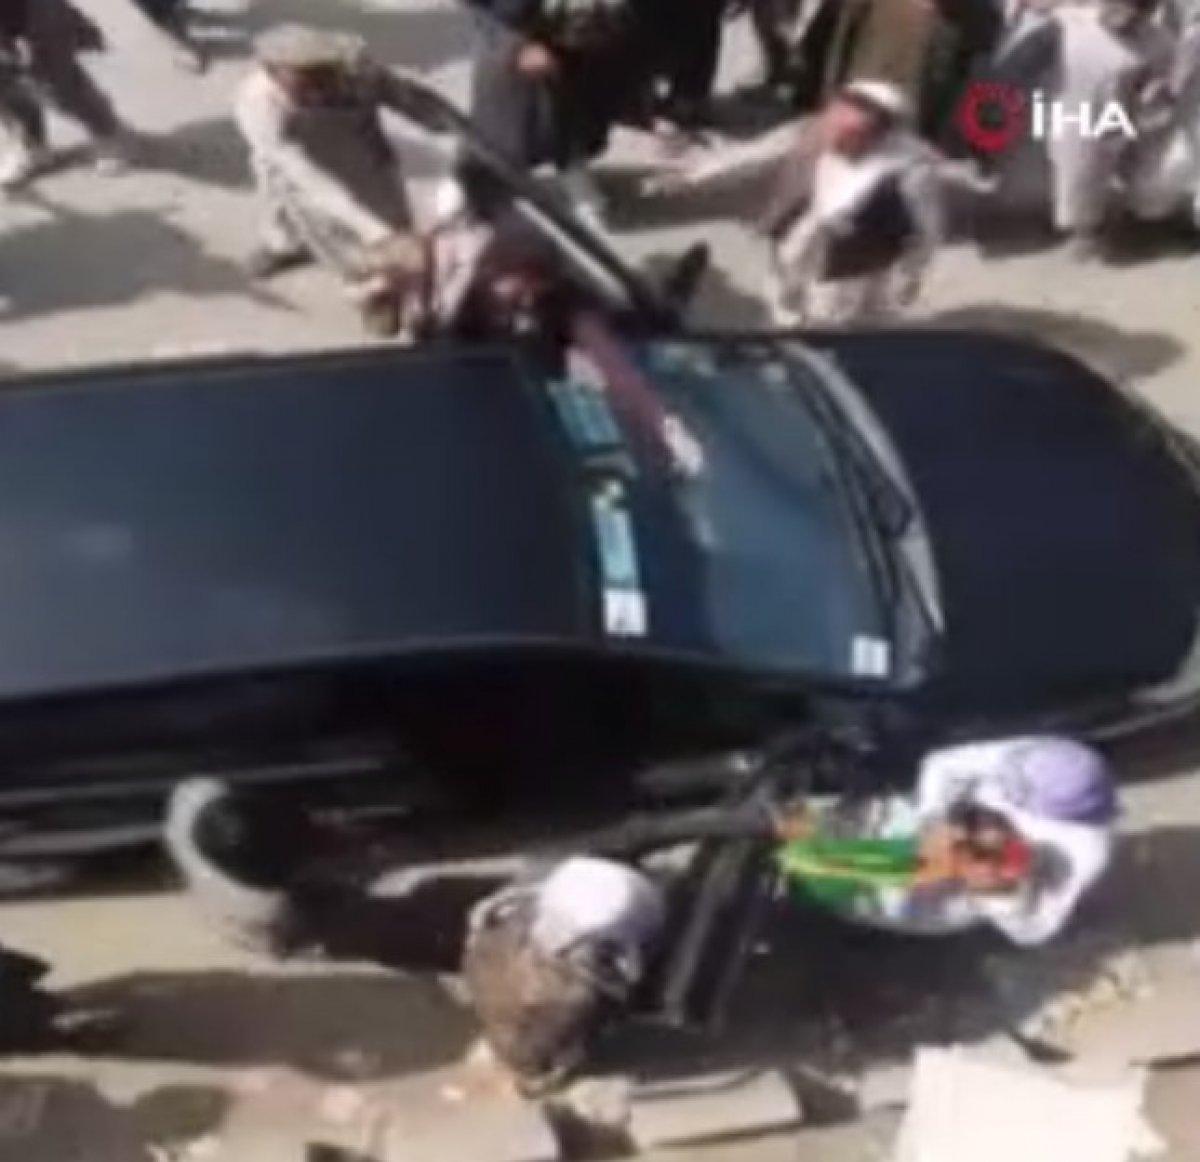 Taliban ın Afganistan bayrağı taşıyanlara müdahalesi  #4